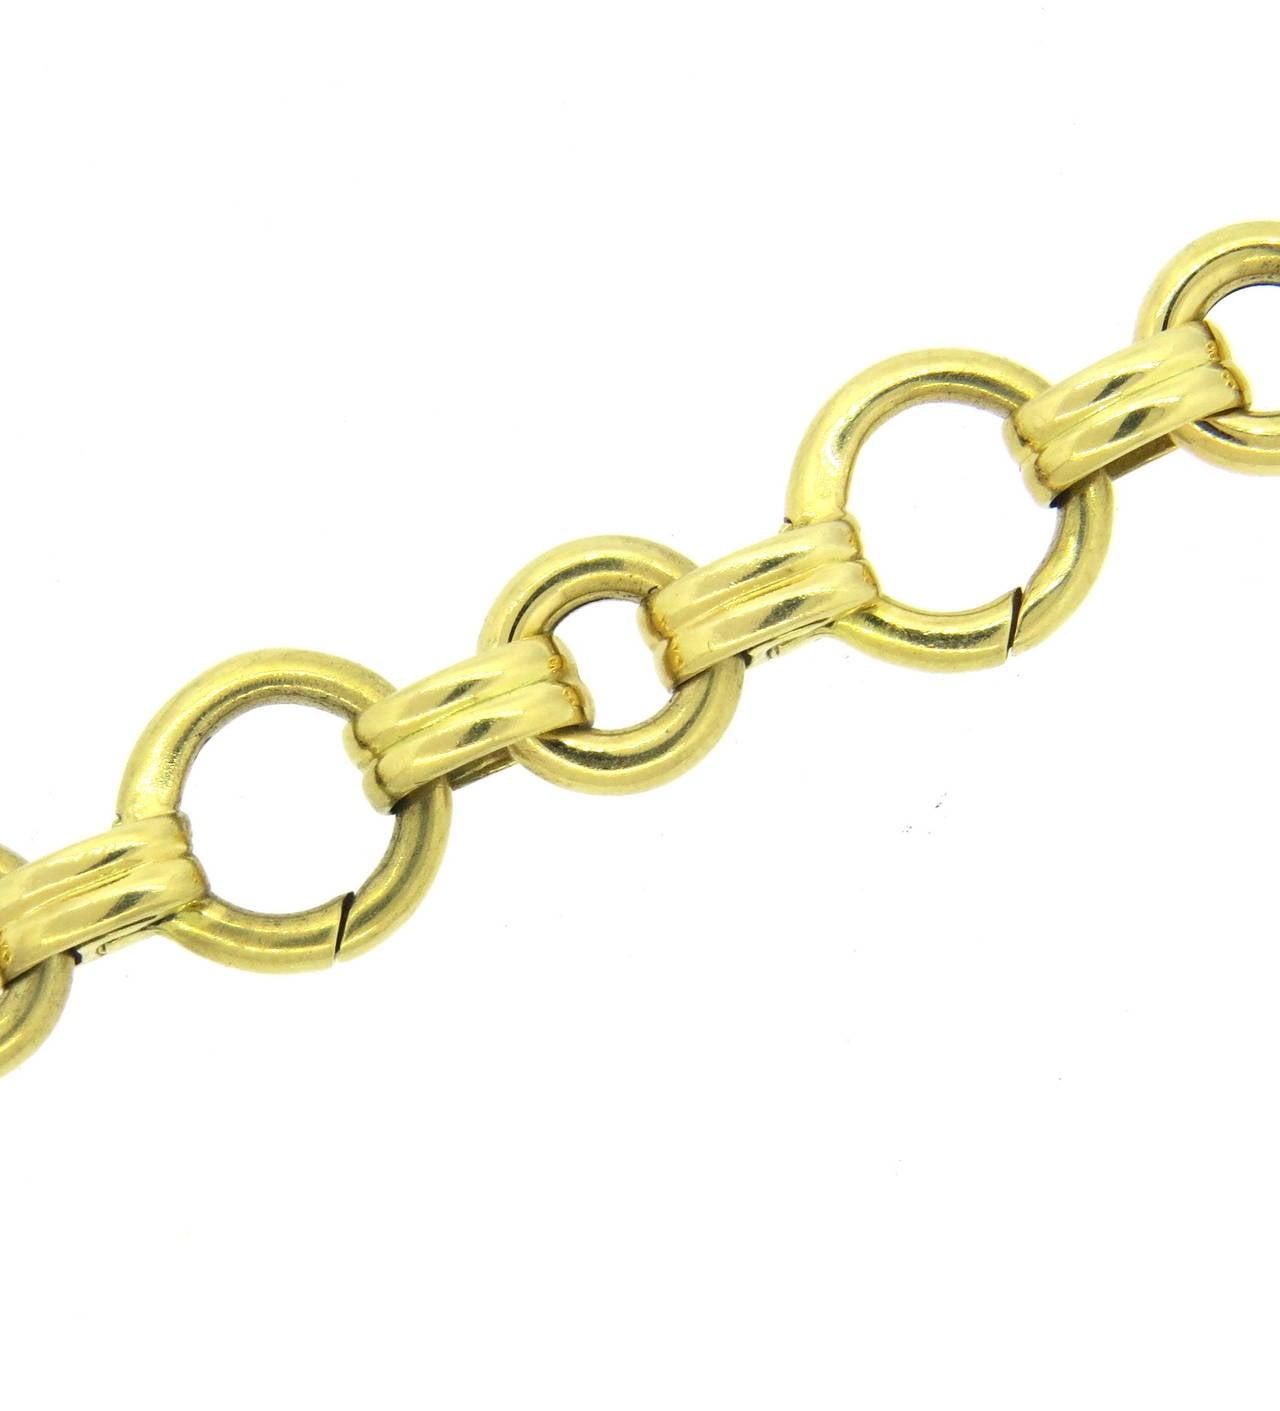 aaron basha gold charm bracelet at 1stdibs